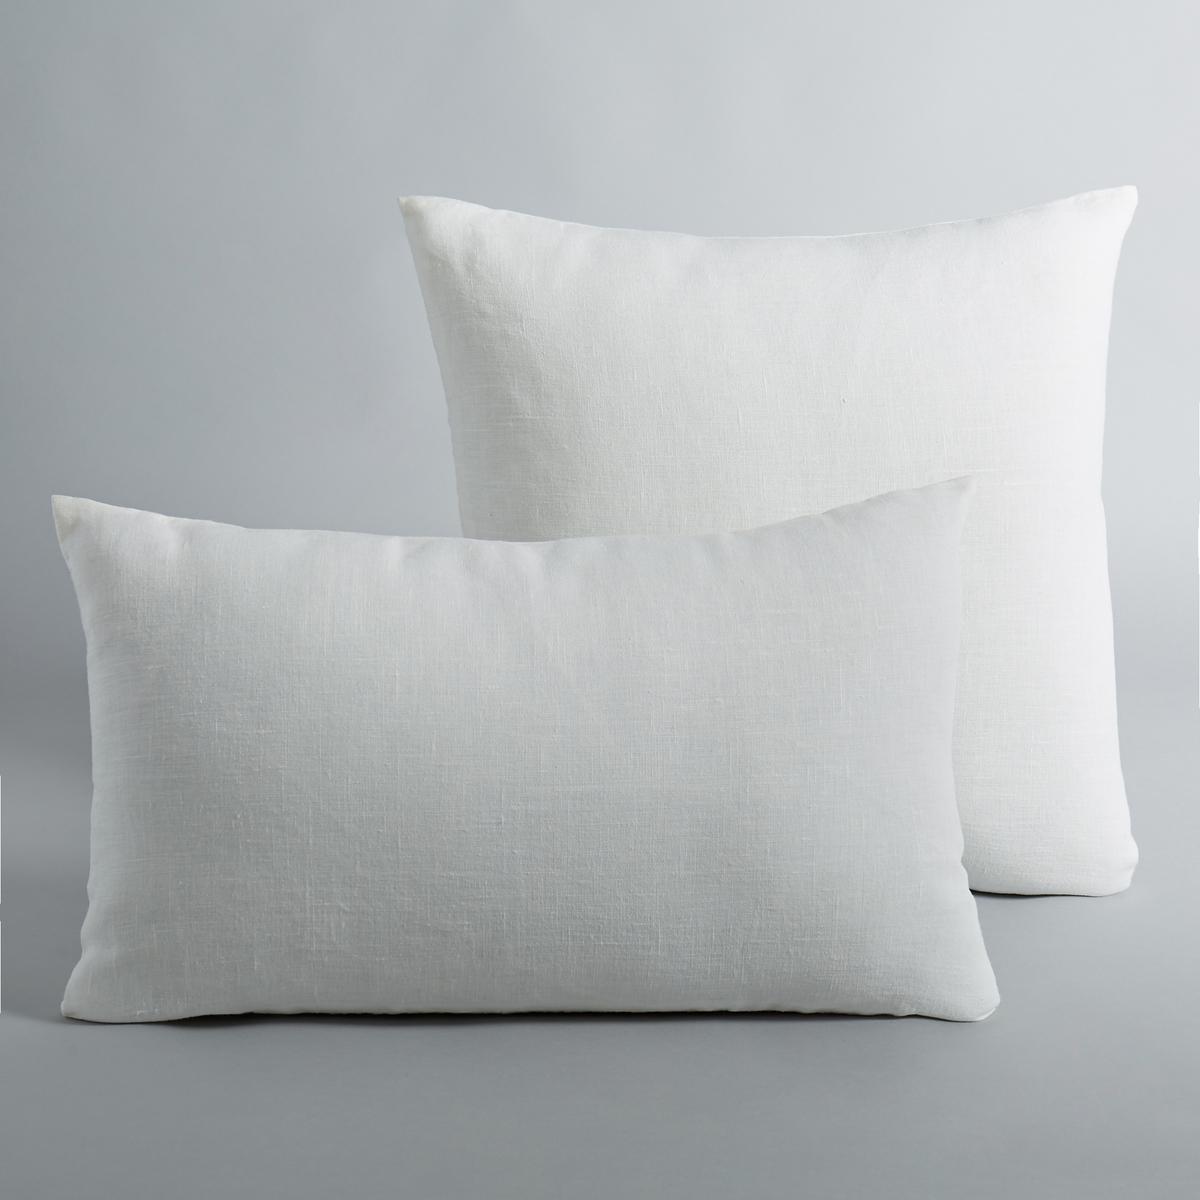 Льняной чехол для подушки, Georgette